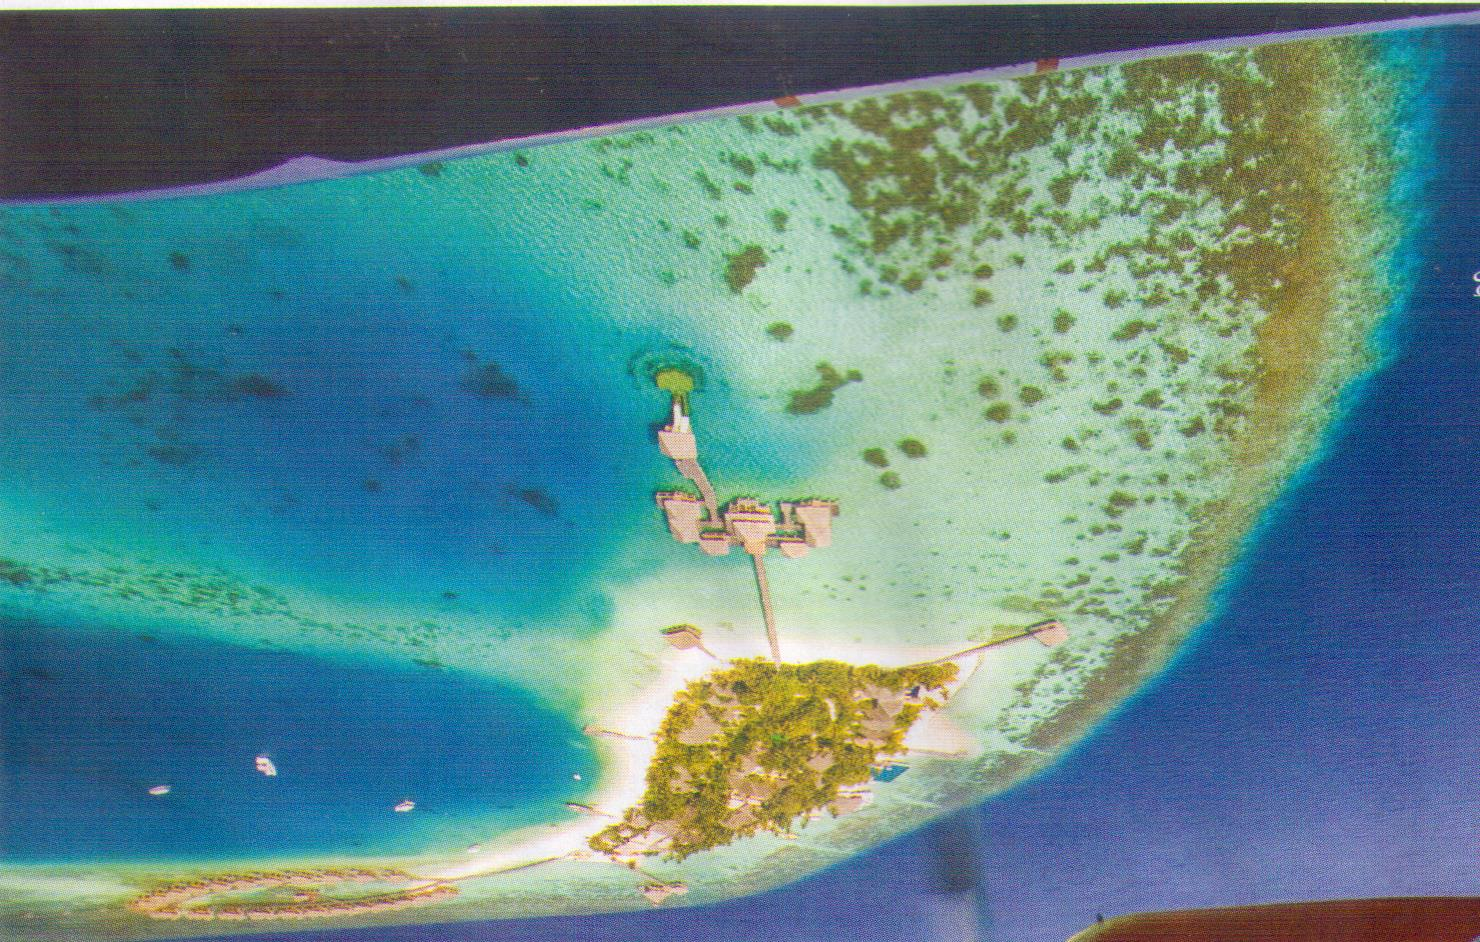 Click image for larger version  Name:Maldives resort.jpeg Views:62 Size:334.2 KB ID:99981